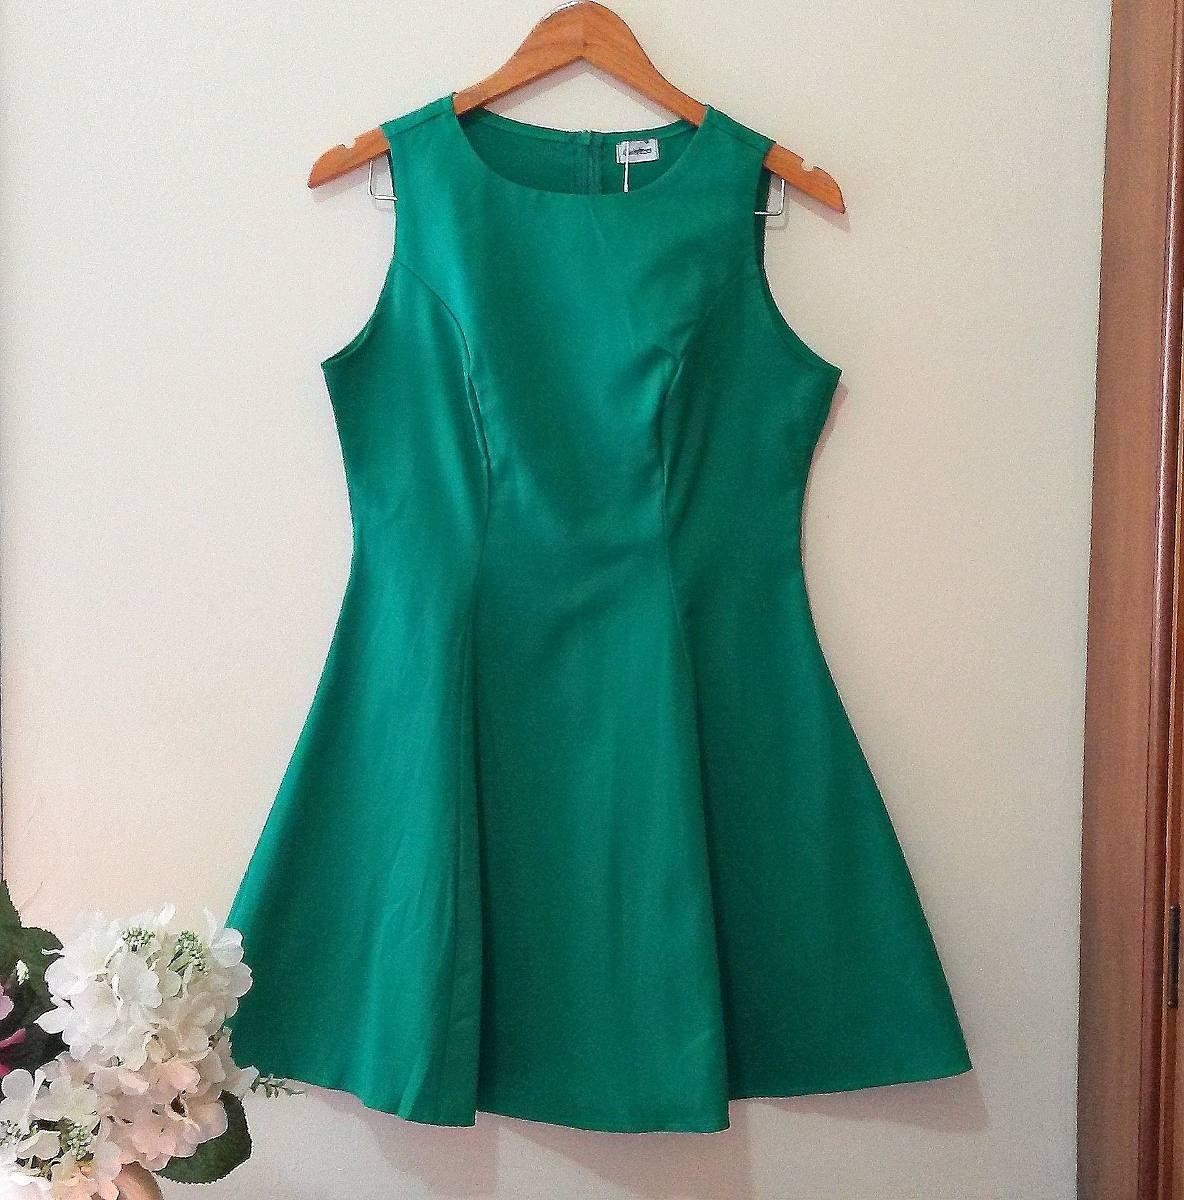 d715842bc2 vestido evasê verde curto feminino casual festa balada. Carregando zoom.